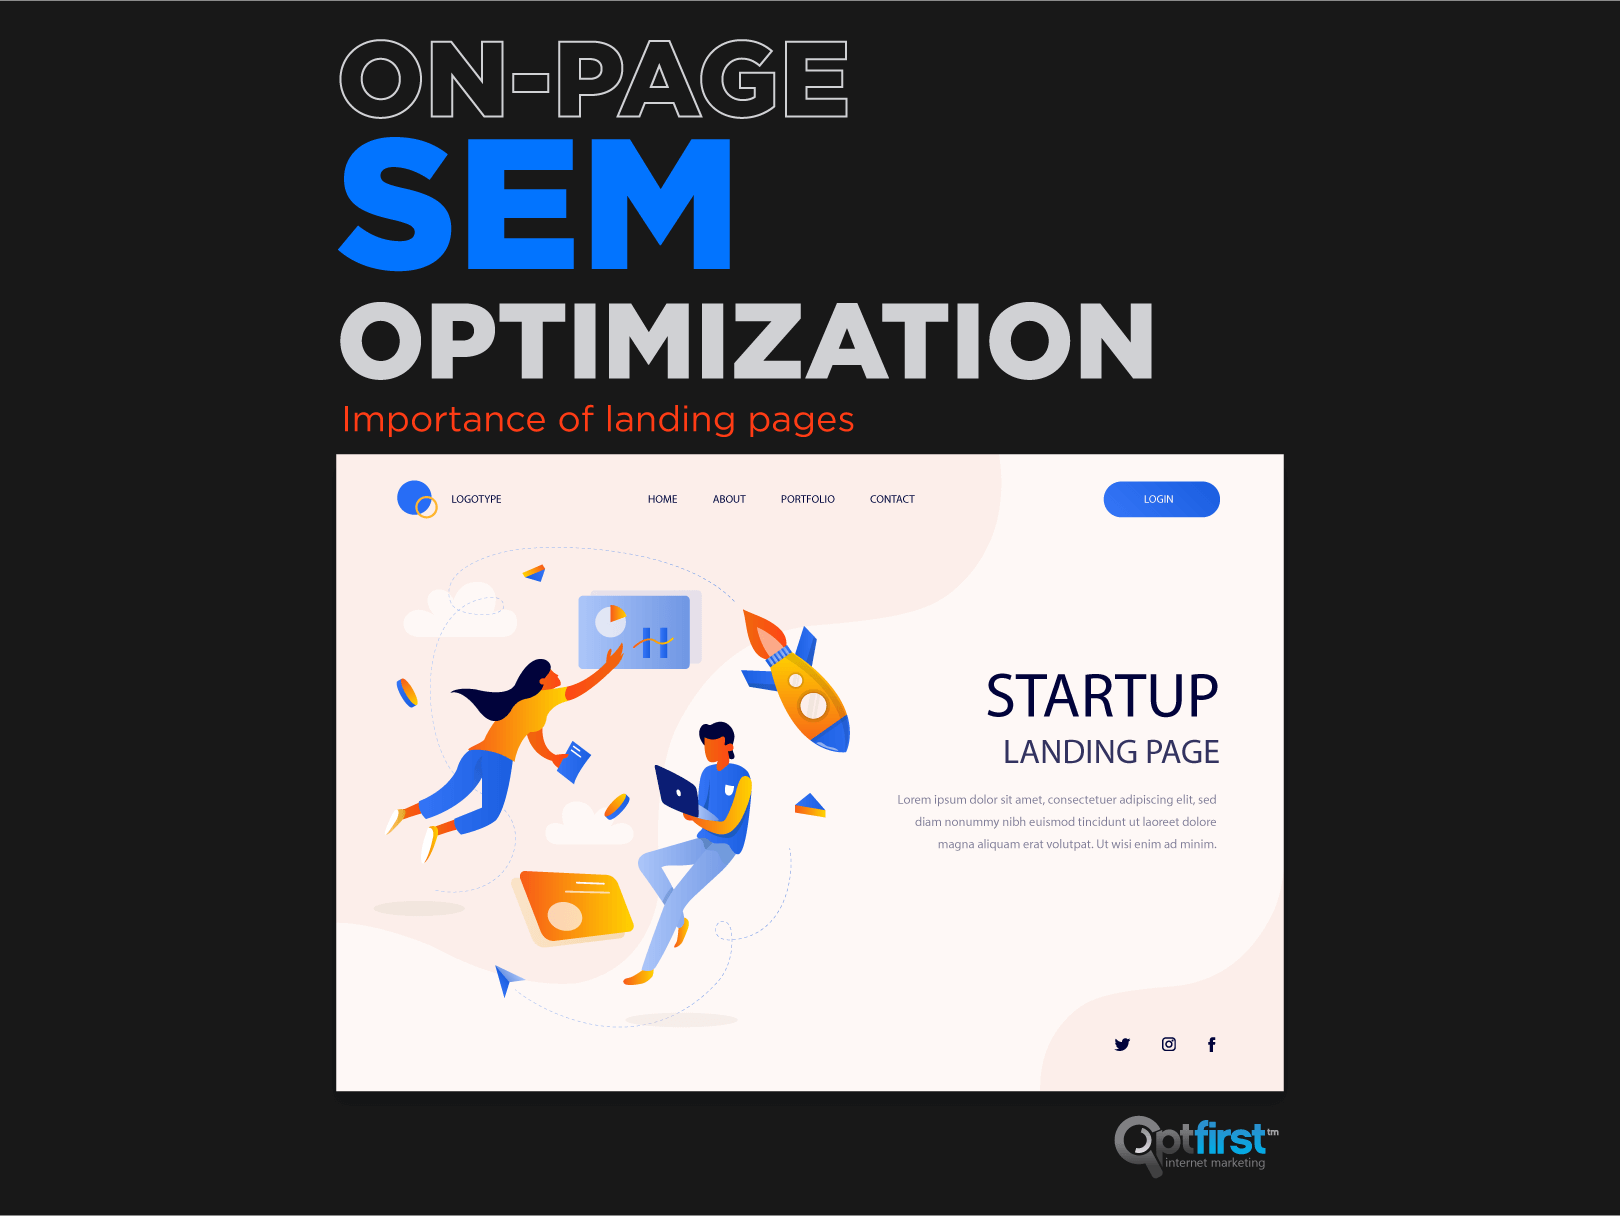 On-Page SEM Optimization - Landing Pages